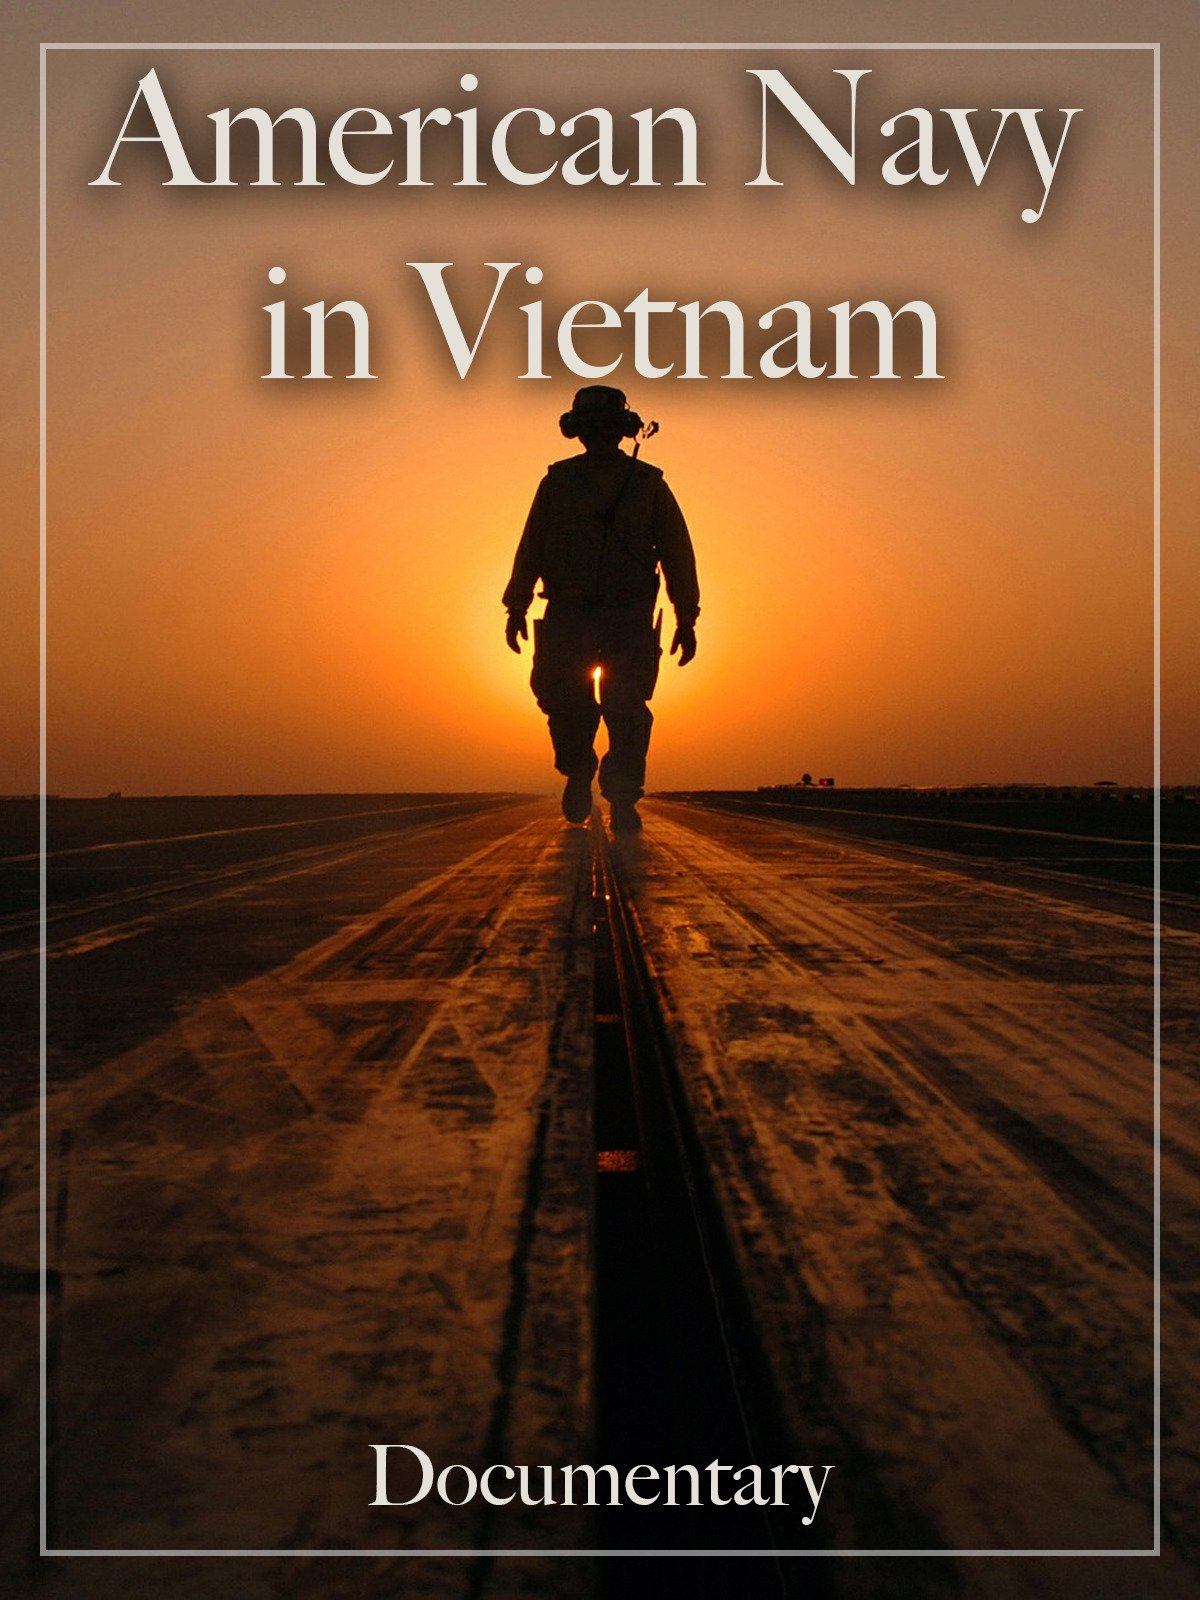 American Navy in Vietnam Documentary